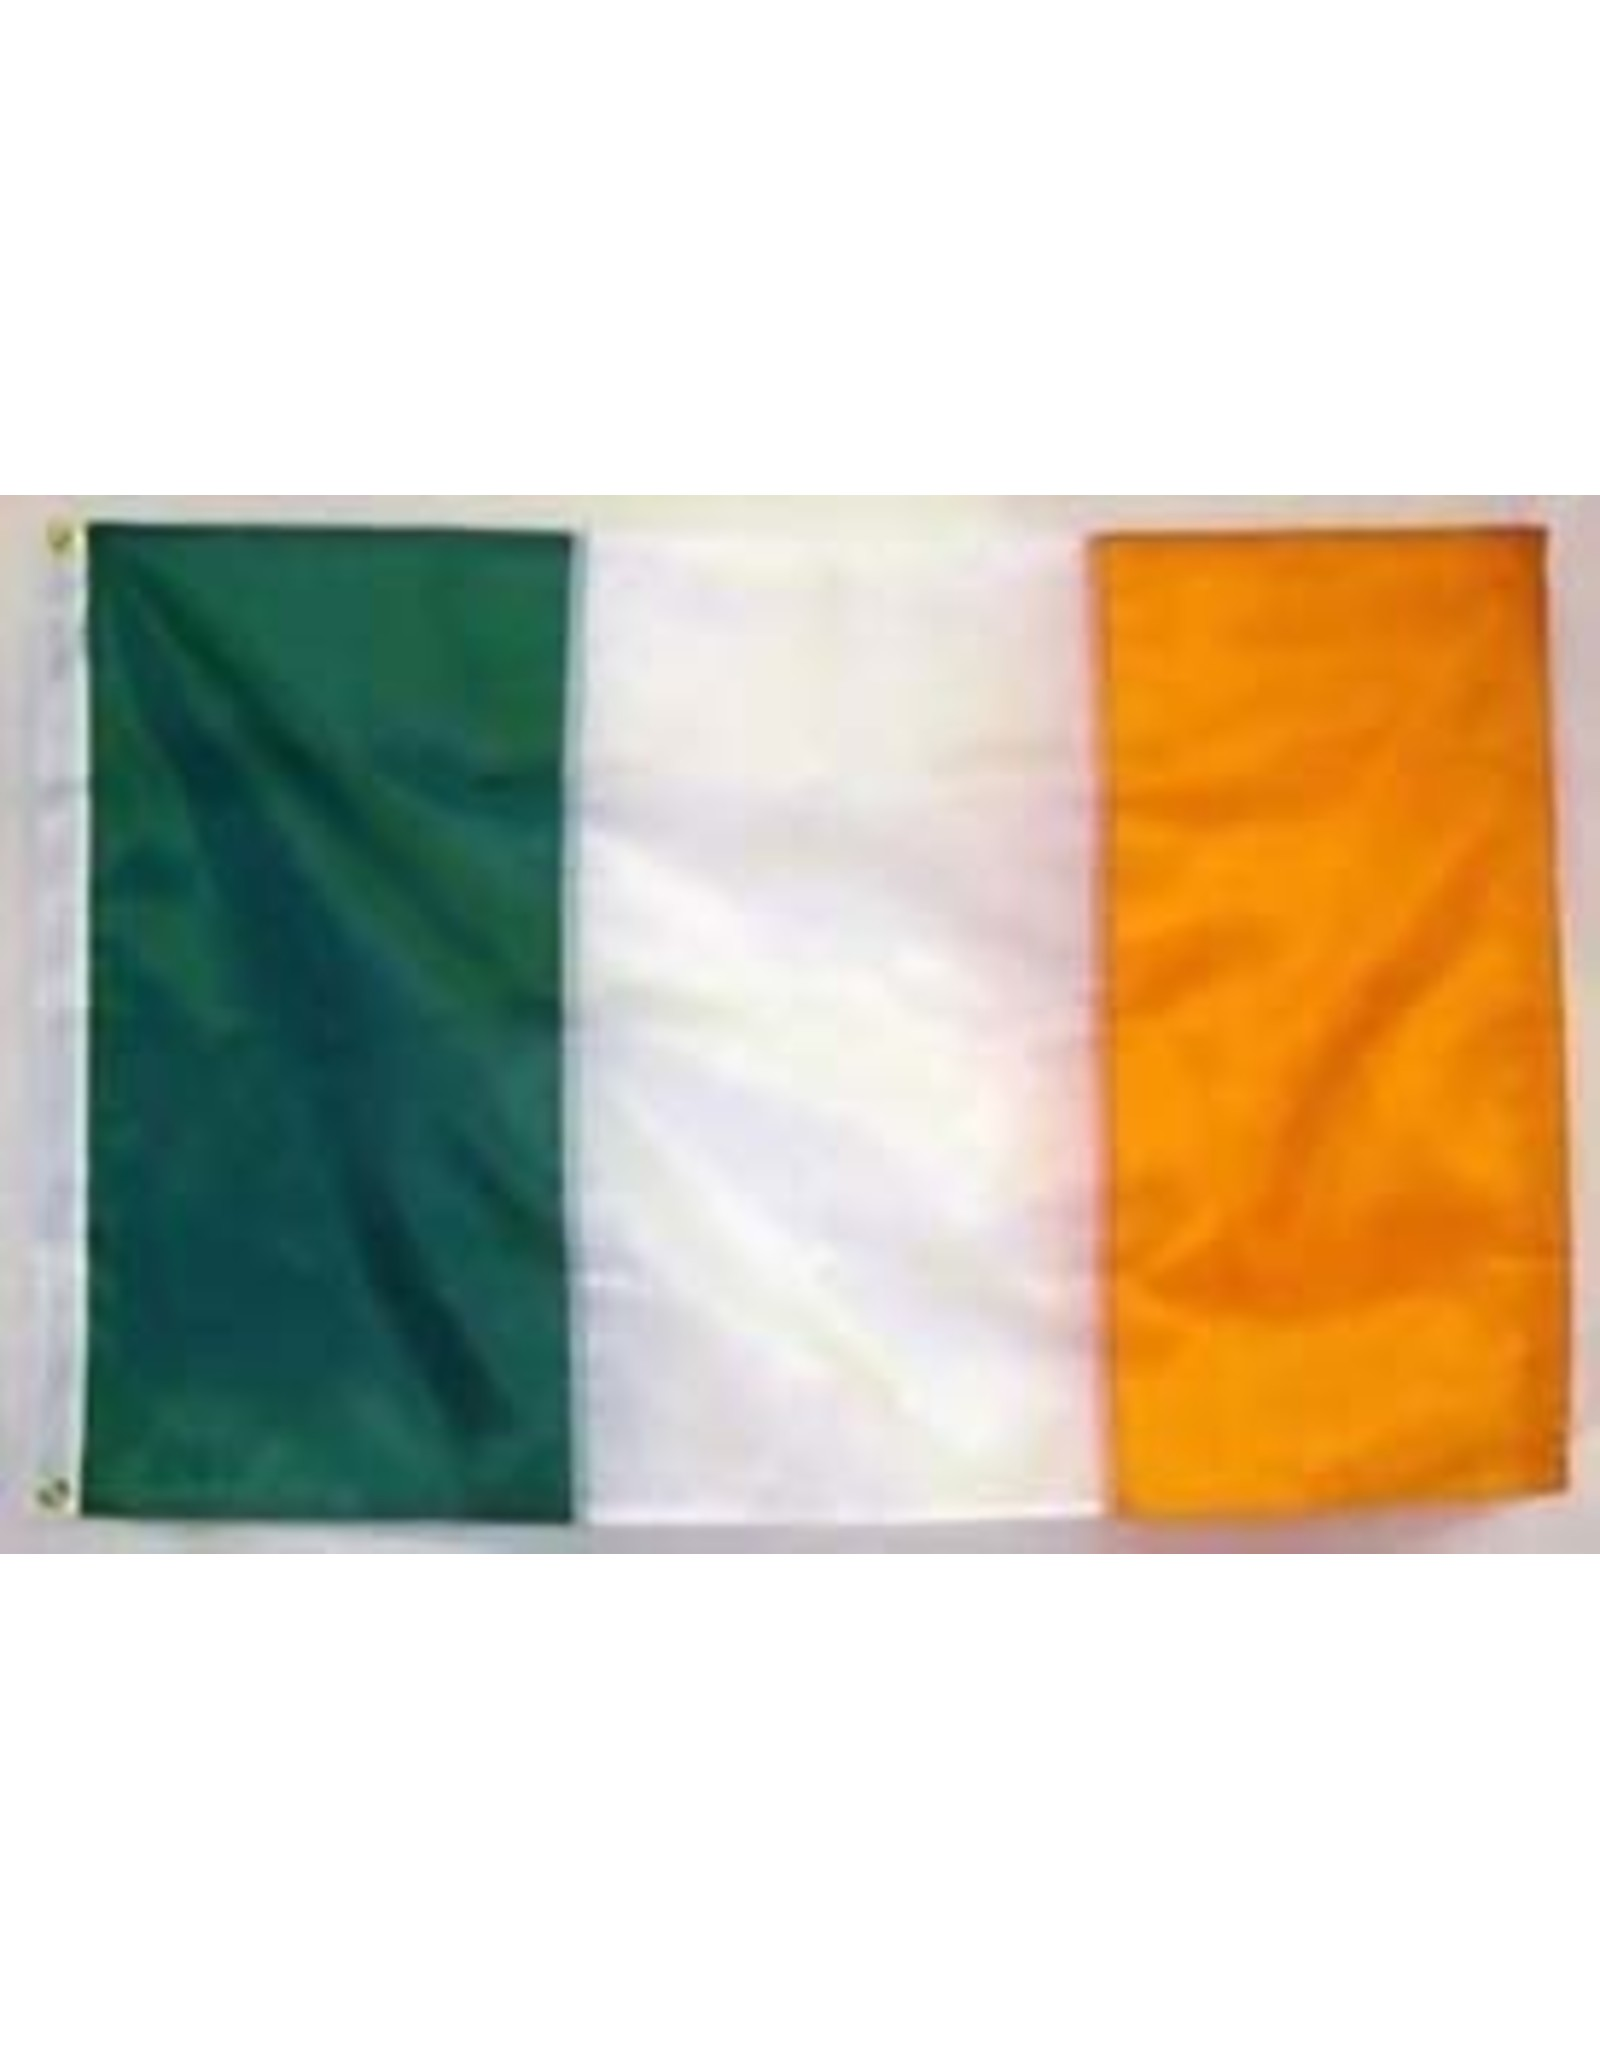 America's Flag Company Ireland Tri-color Nylon Flag 3x5